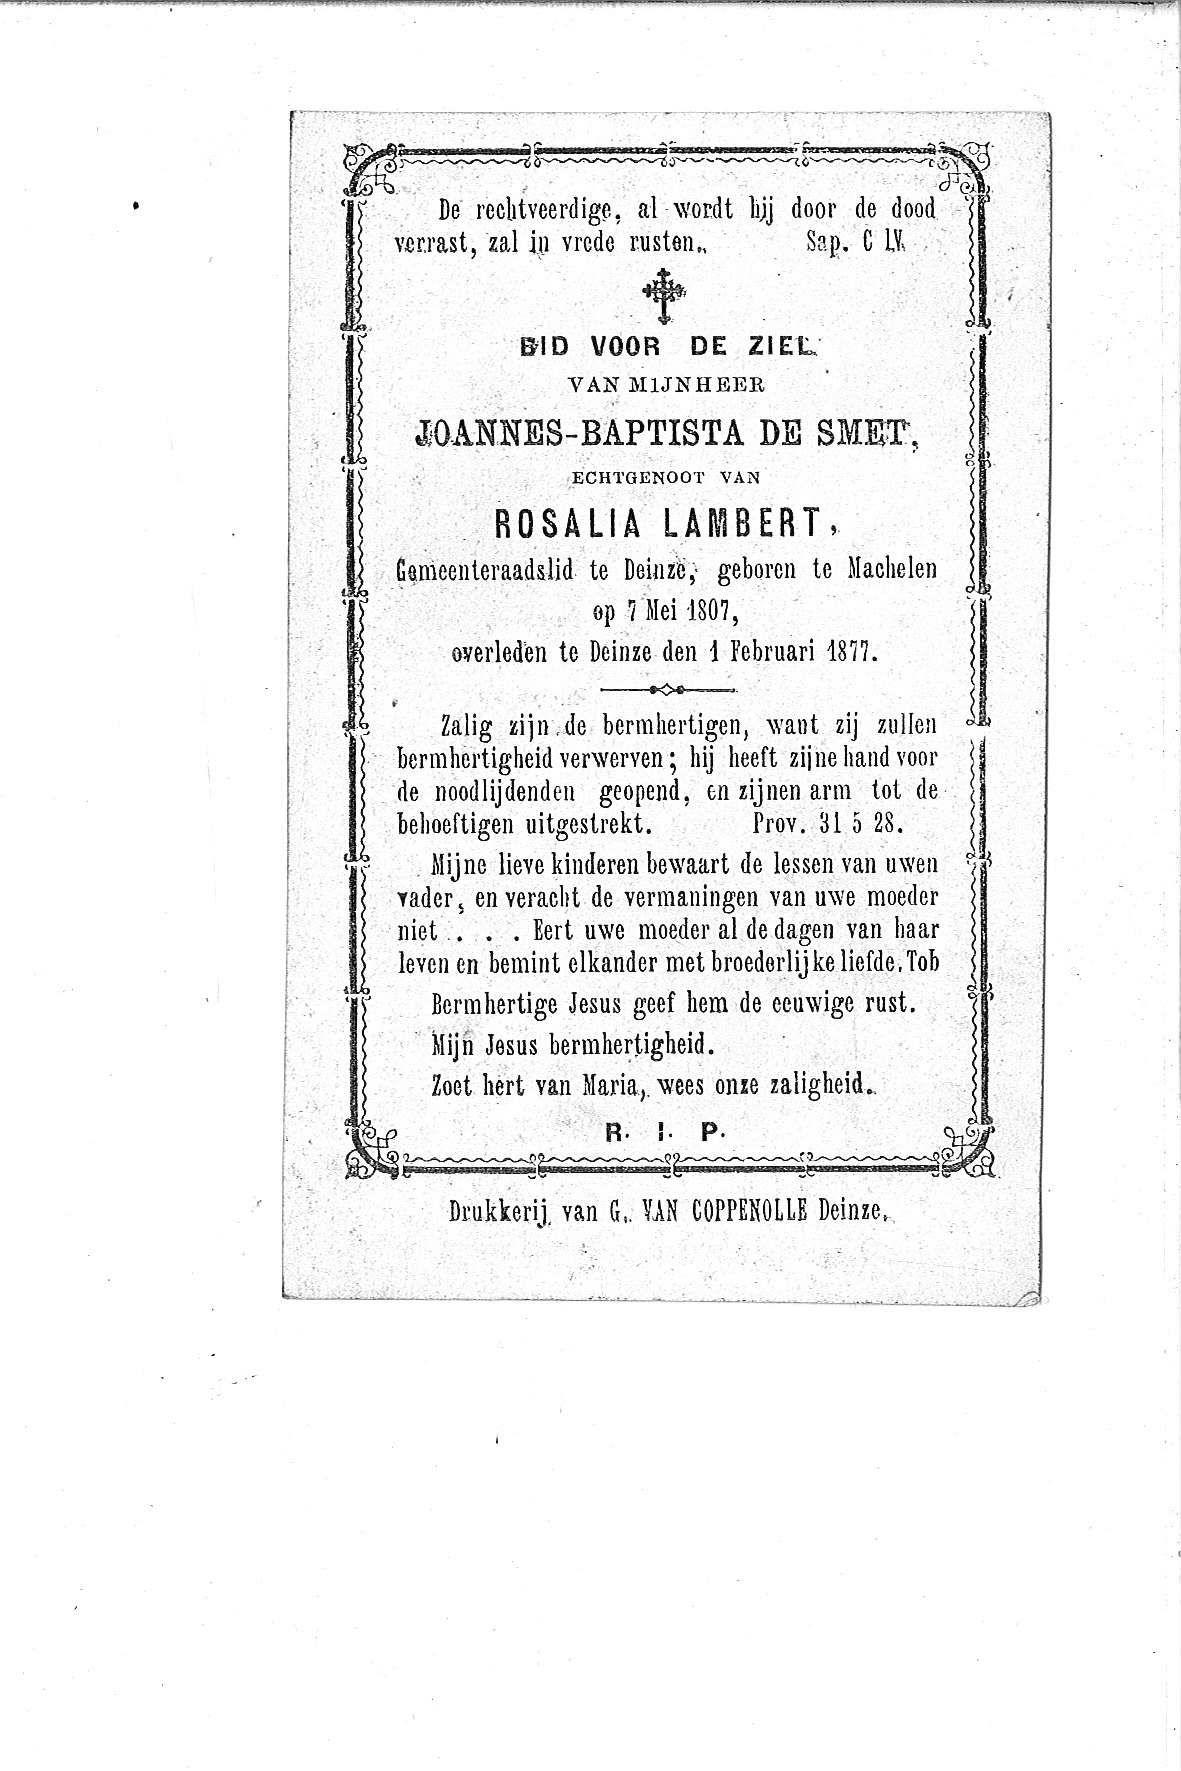 Joannes-Baptista (1877) 20120424083759_00250.jpg